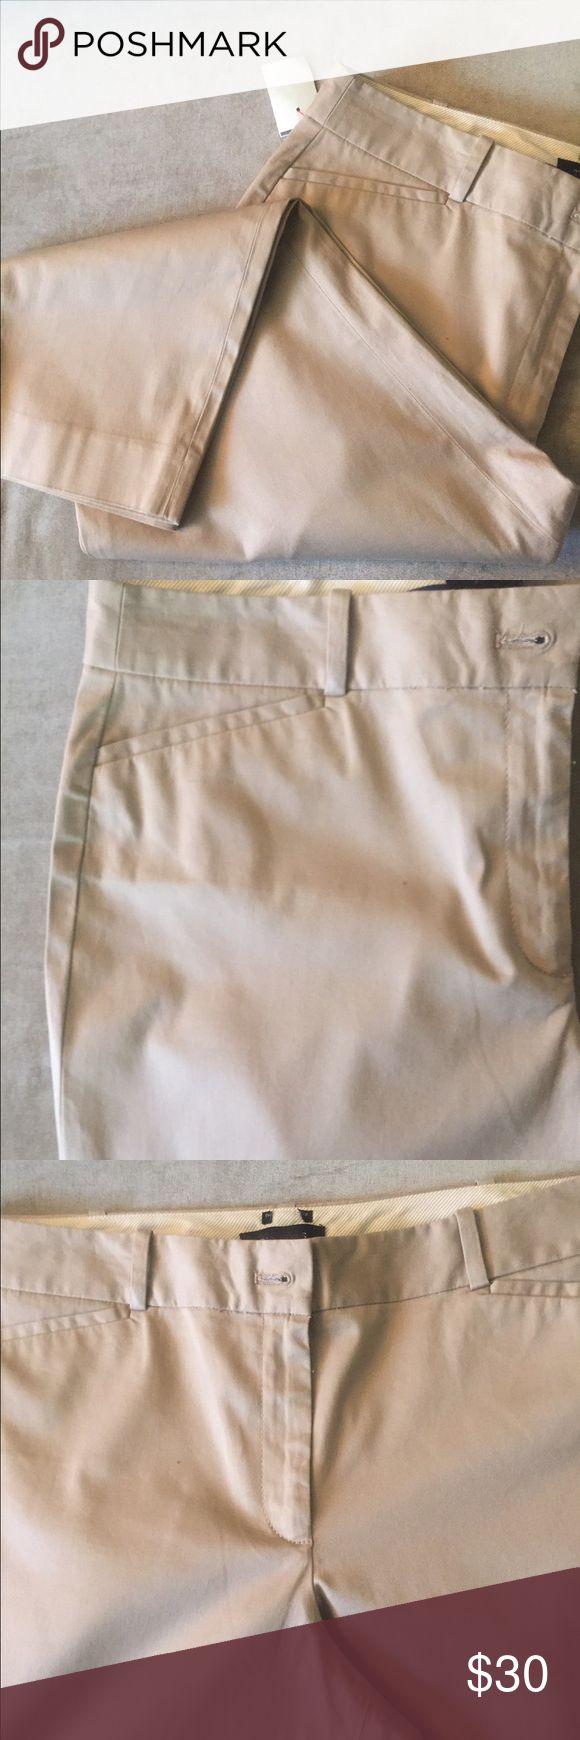 "Talbots Khaki Capris New with tag and never worn. Waist 18"" inseam 22"" Talbots Pants Capris"